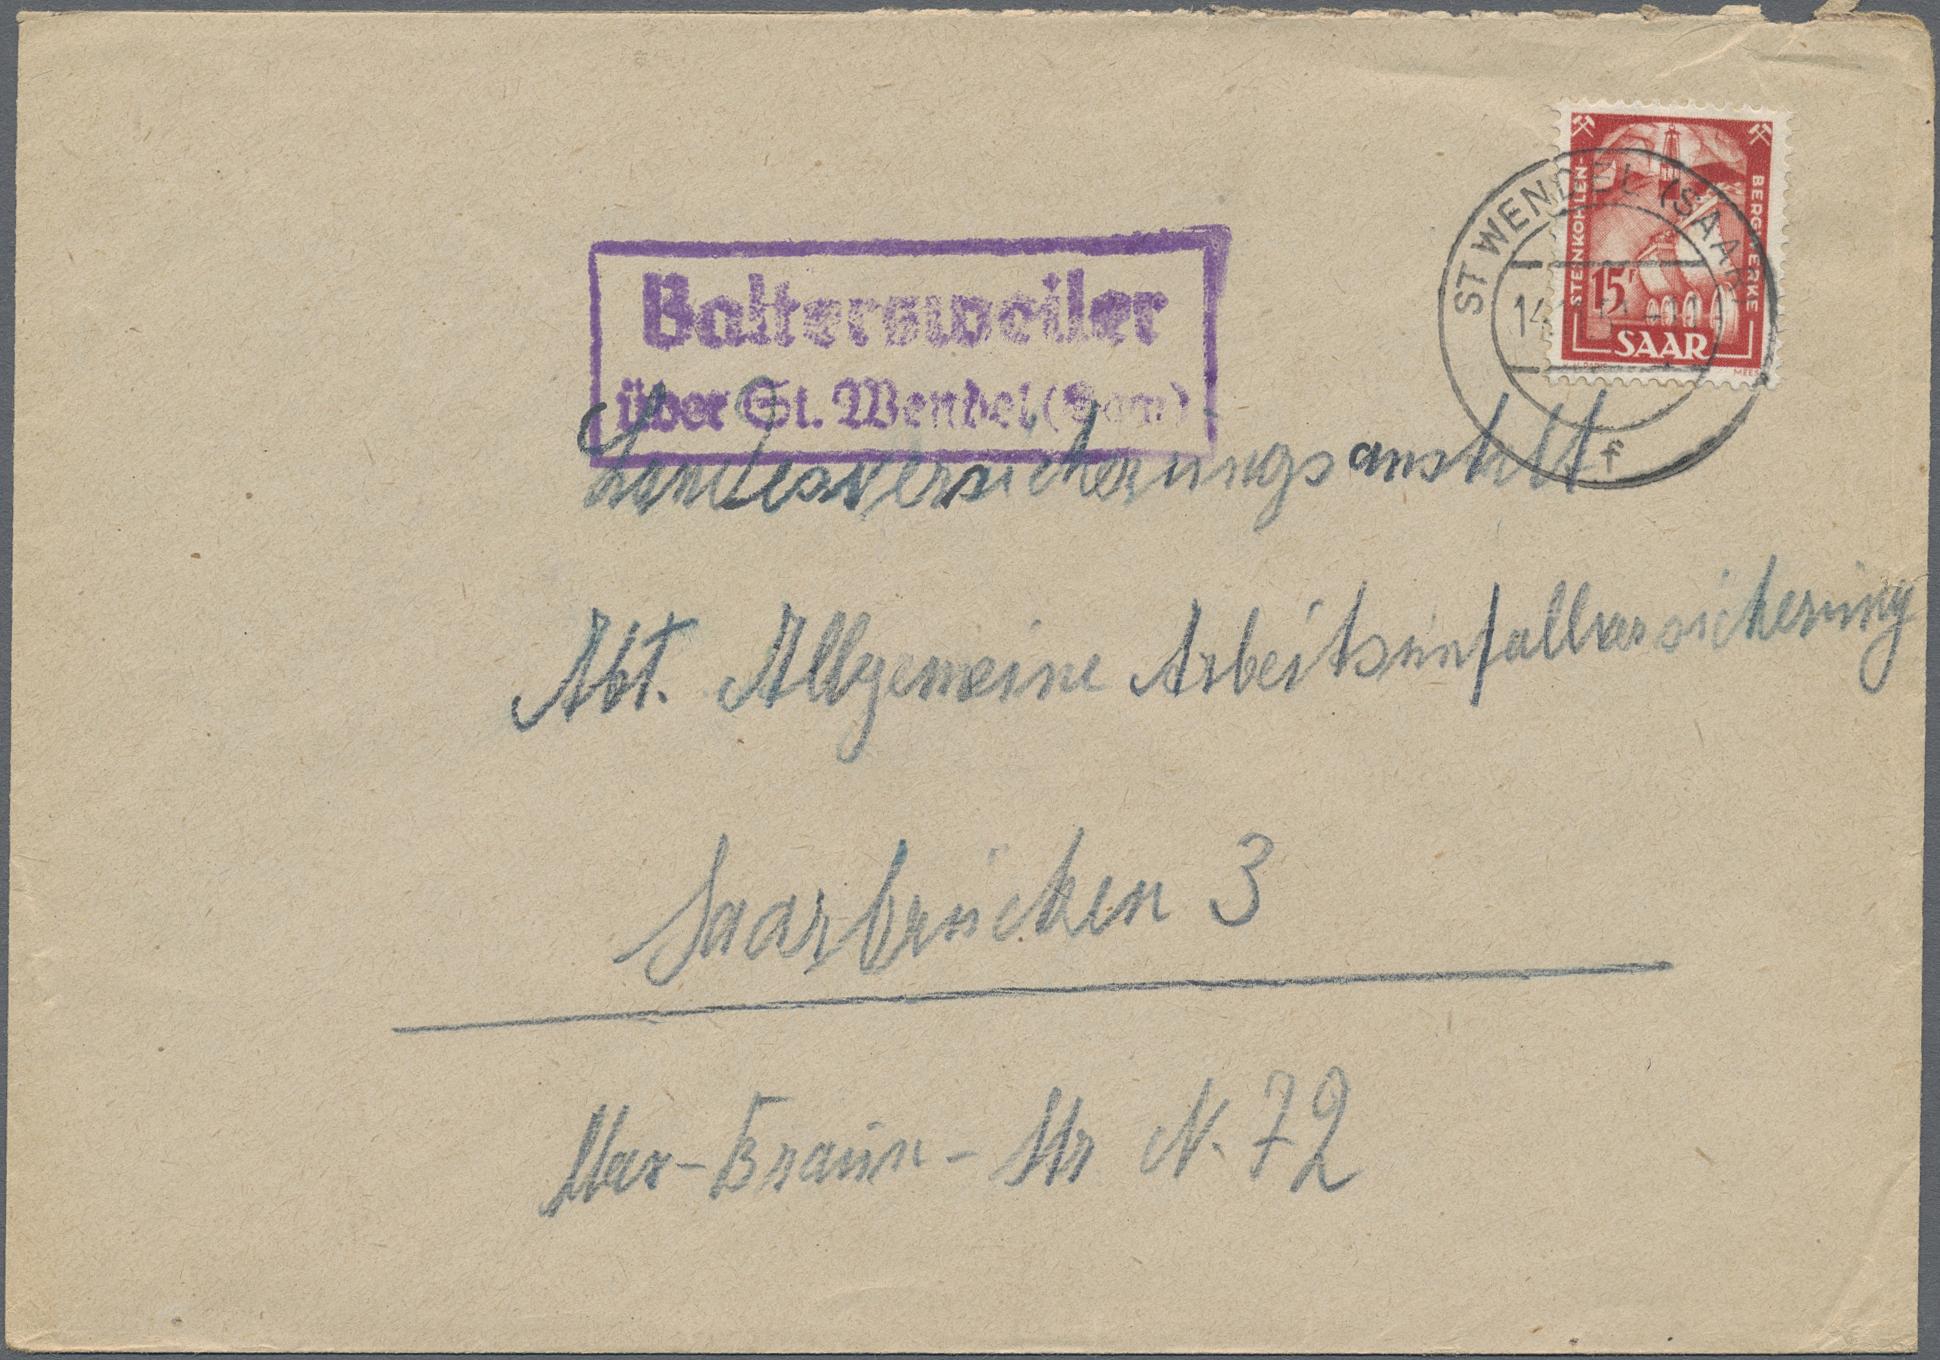 Lot 28858 - Deutsche Abstimmungsgebiete: Saargebiet  -  Auktionshaus Christoph Gärtner GmbH & Co. KG Sale #46 Gollcetions Germany - including the suplement